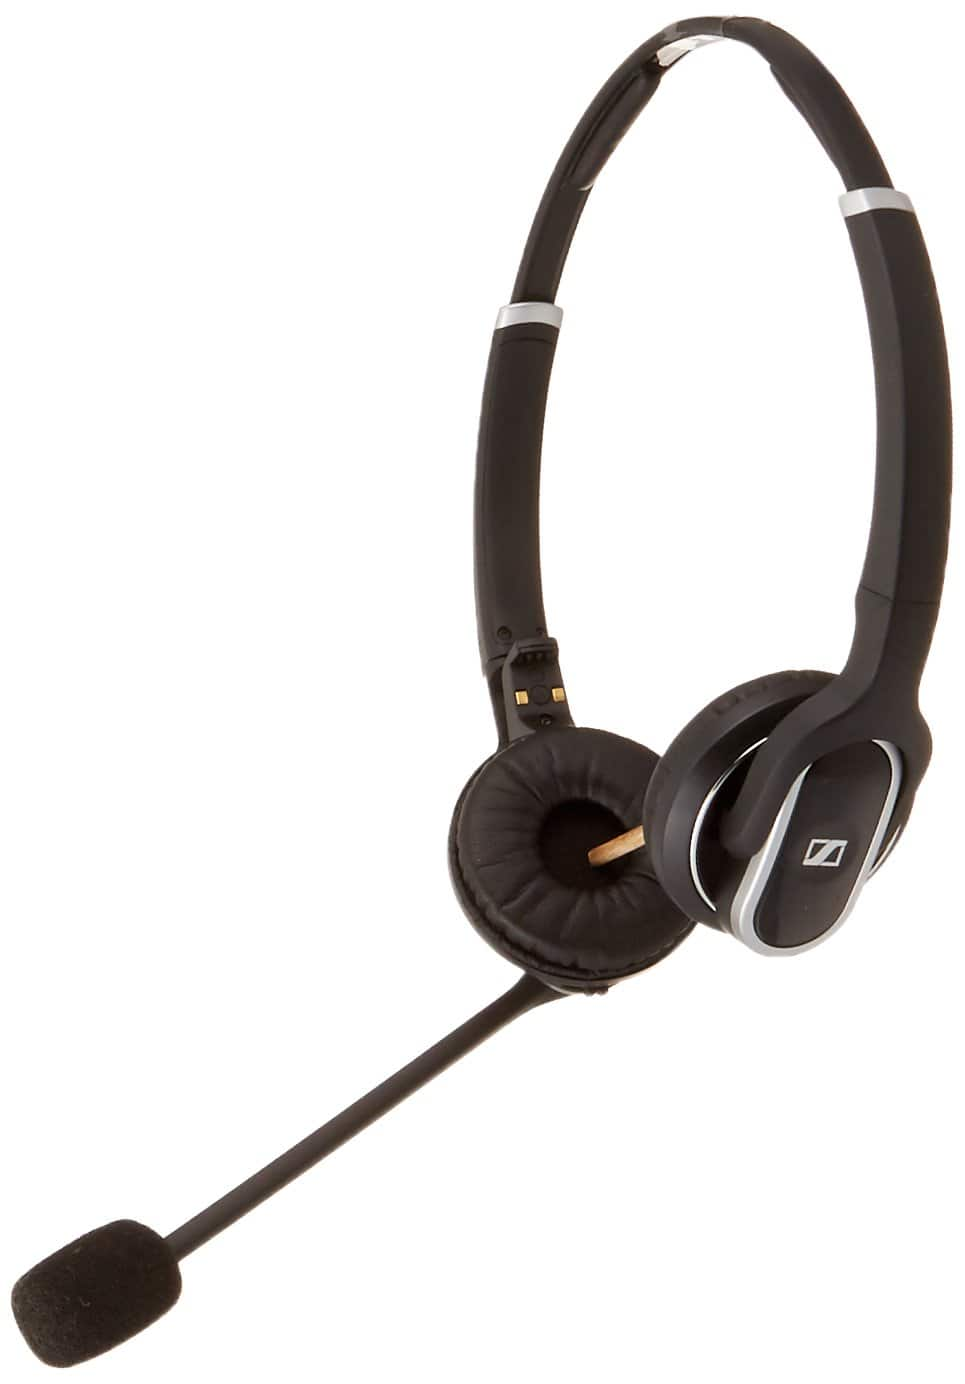 Sennheiser DW Pro2 DECT 6.0 Wireless Office Headset $43.30 + free s/h